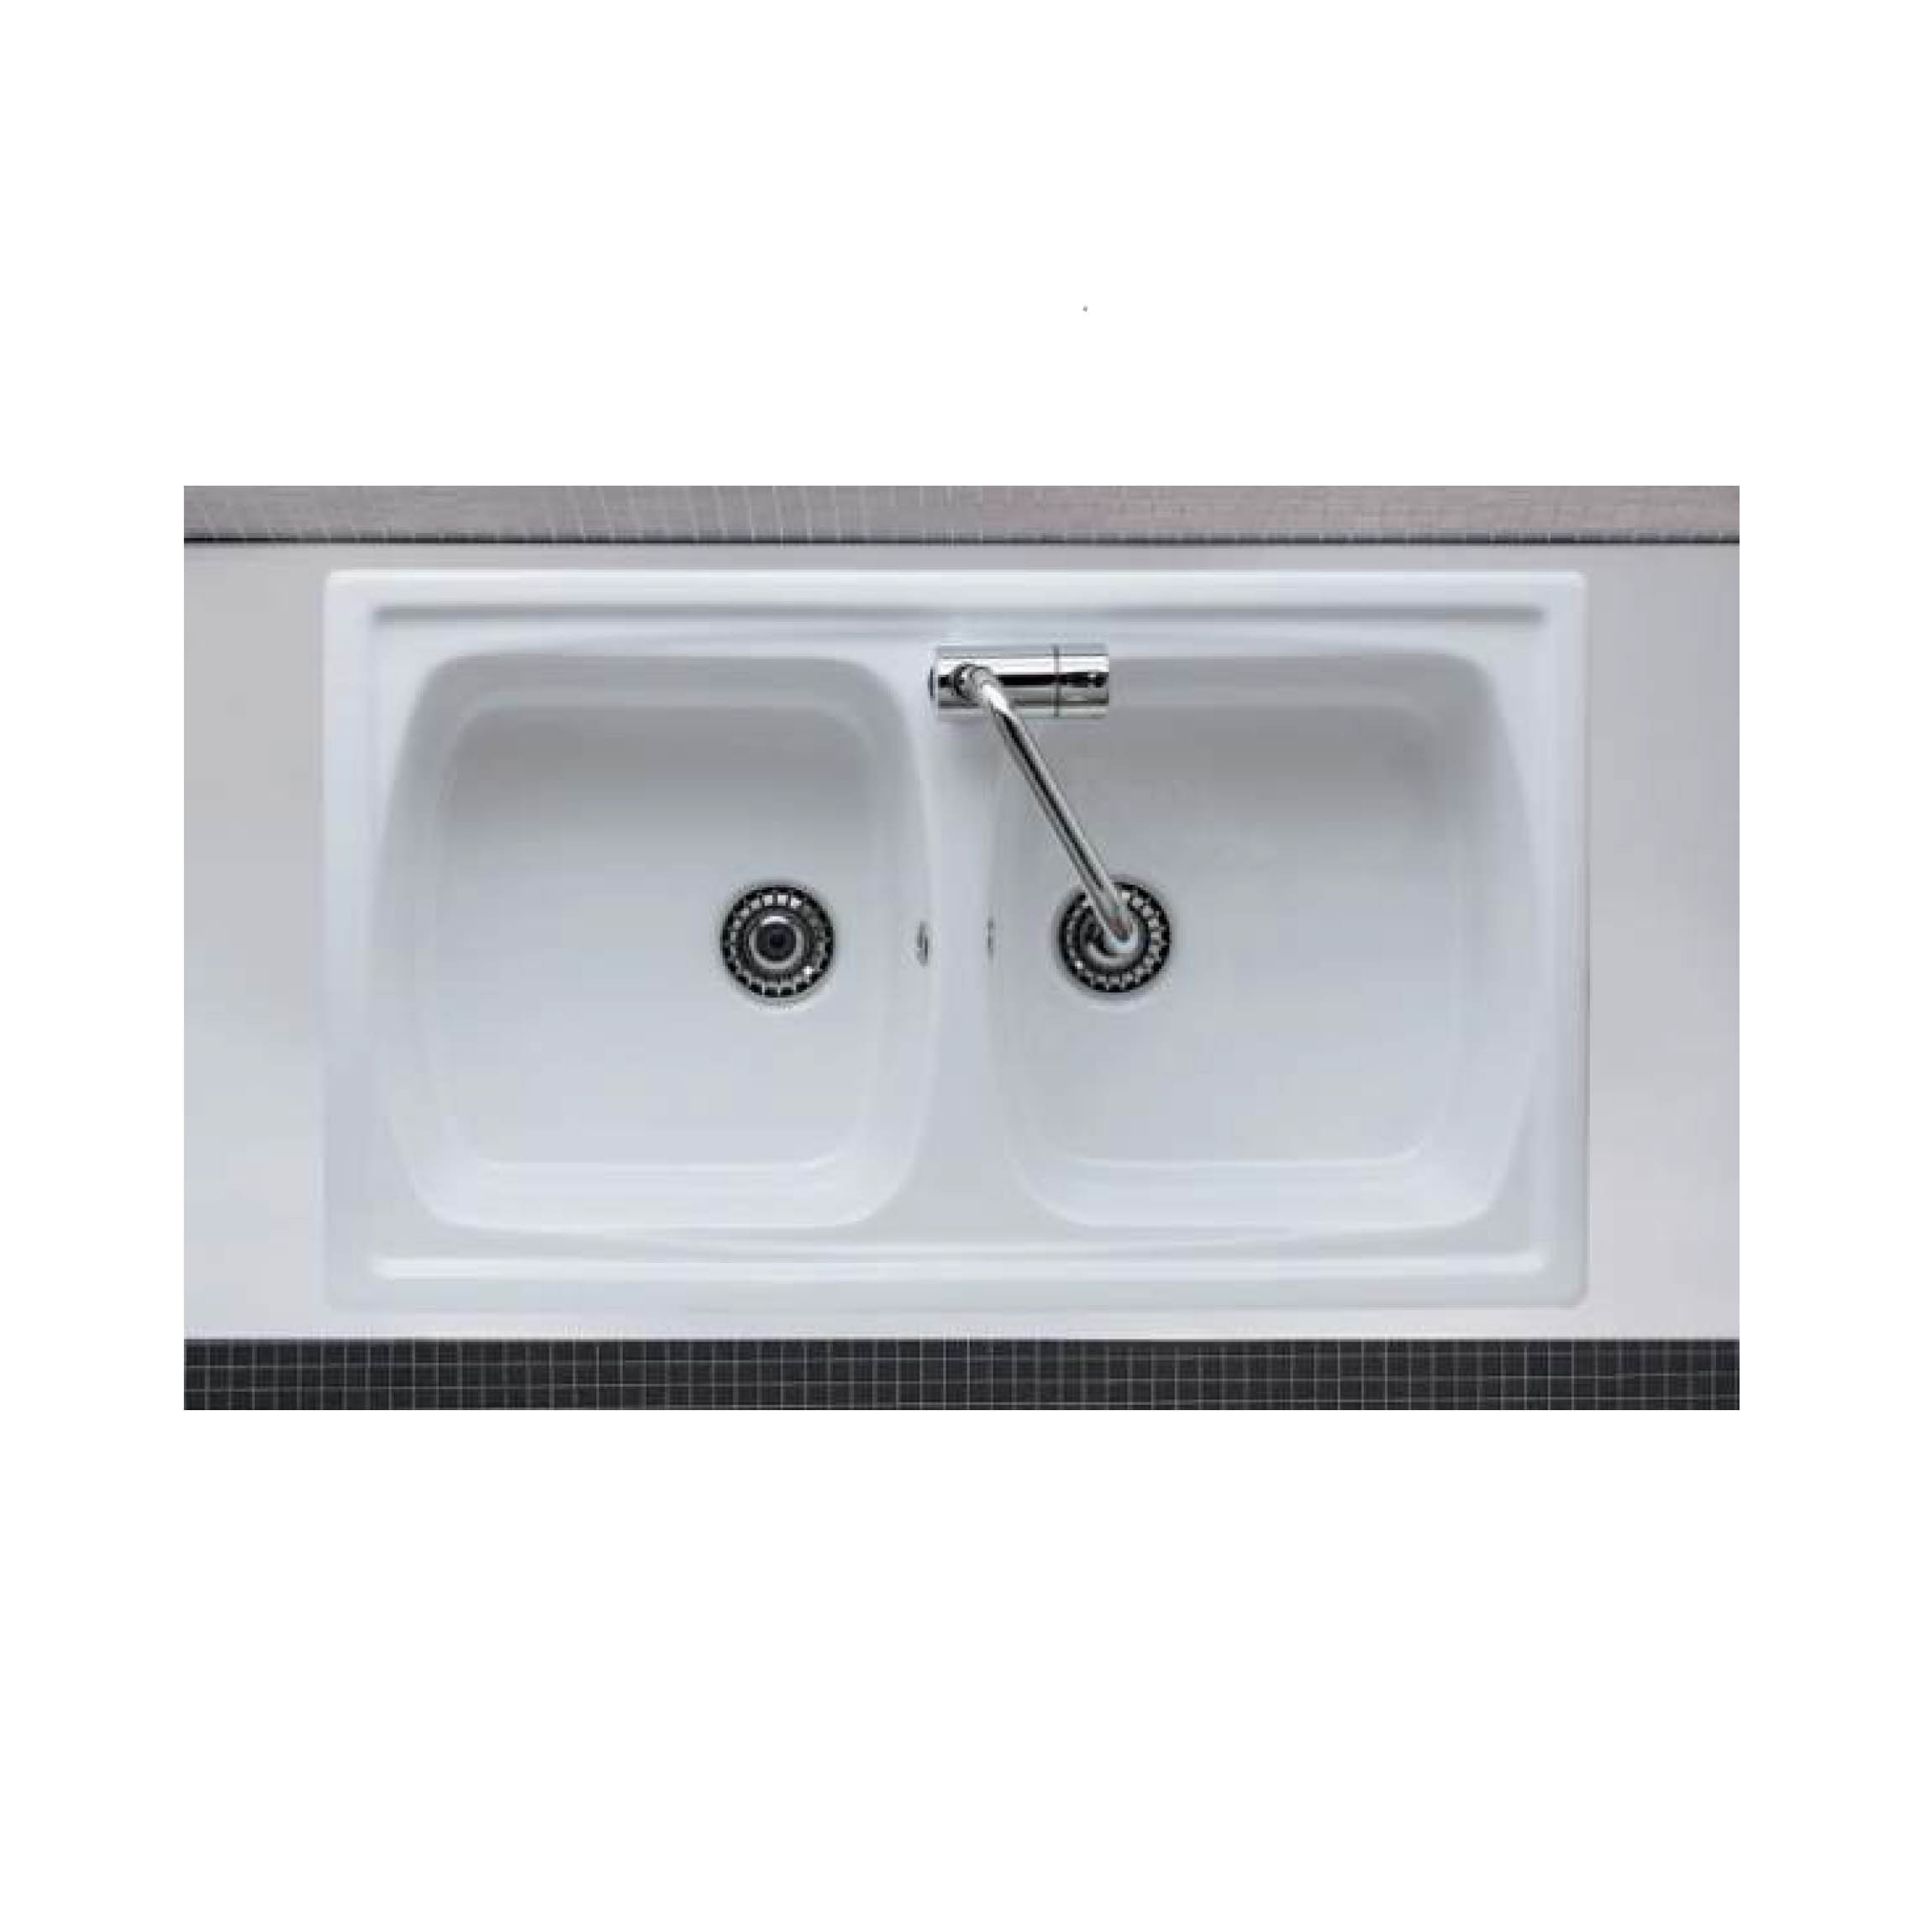 Lavello In Ceramica Da Cucina lavello incasso 2 vasche reversibile 86x50 cm. opera sanitari